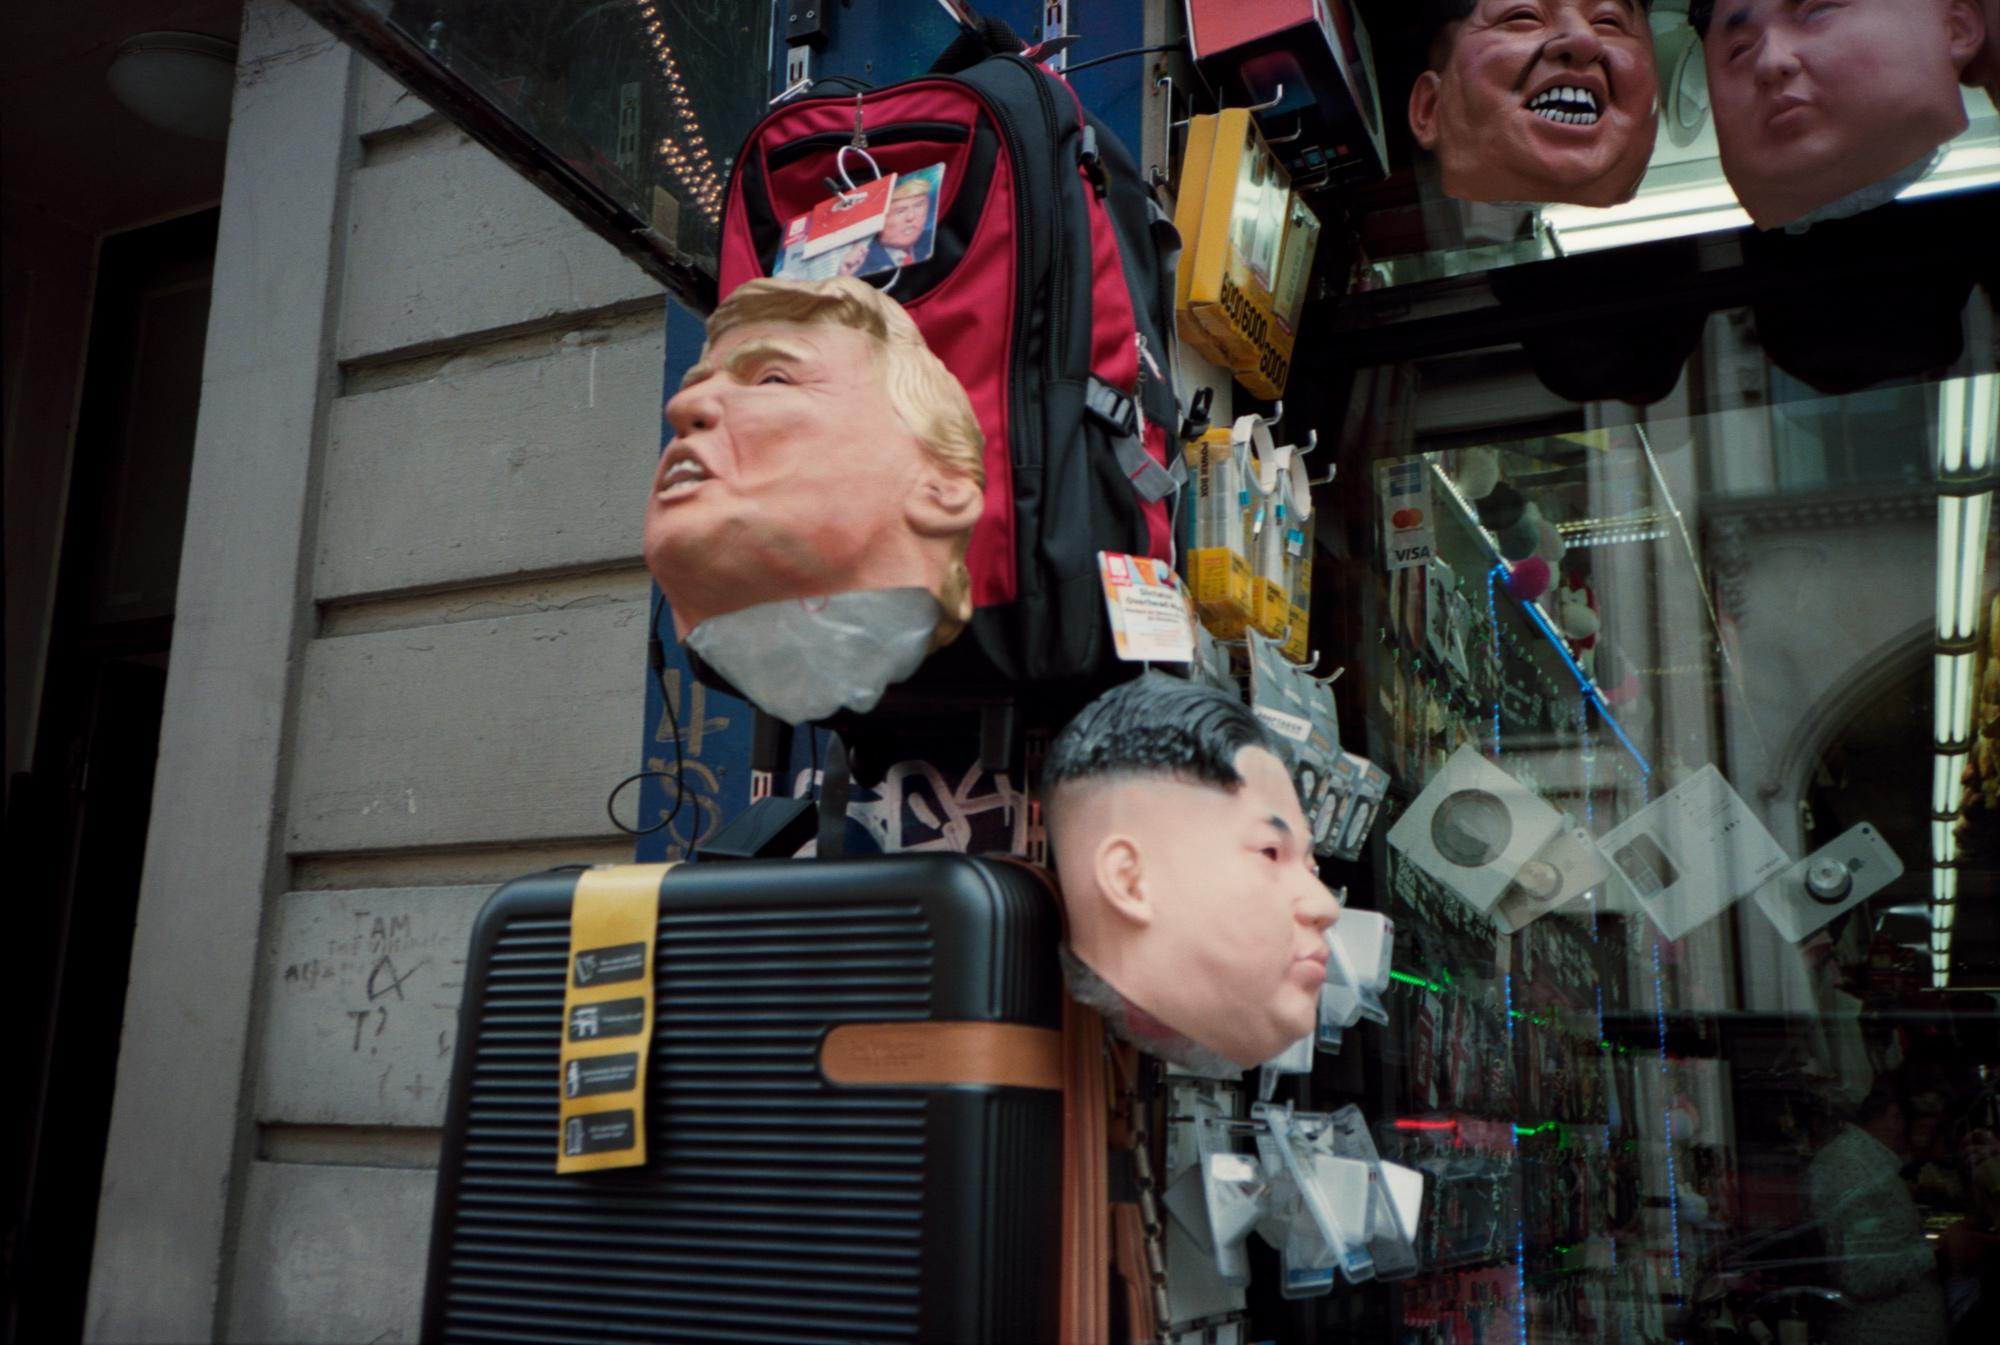 Political Humour, Donald Trump, kim Jong Un, Observations Series, Photography by ioannis Koussertari